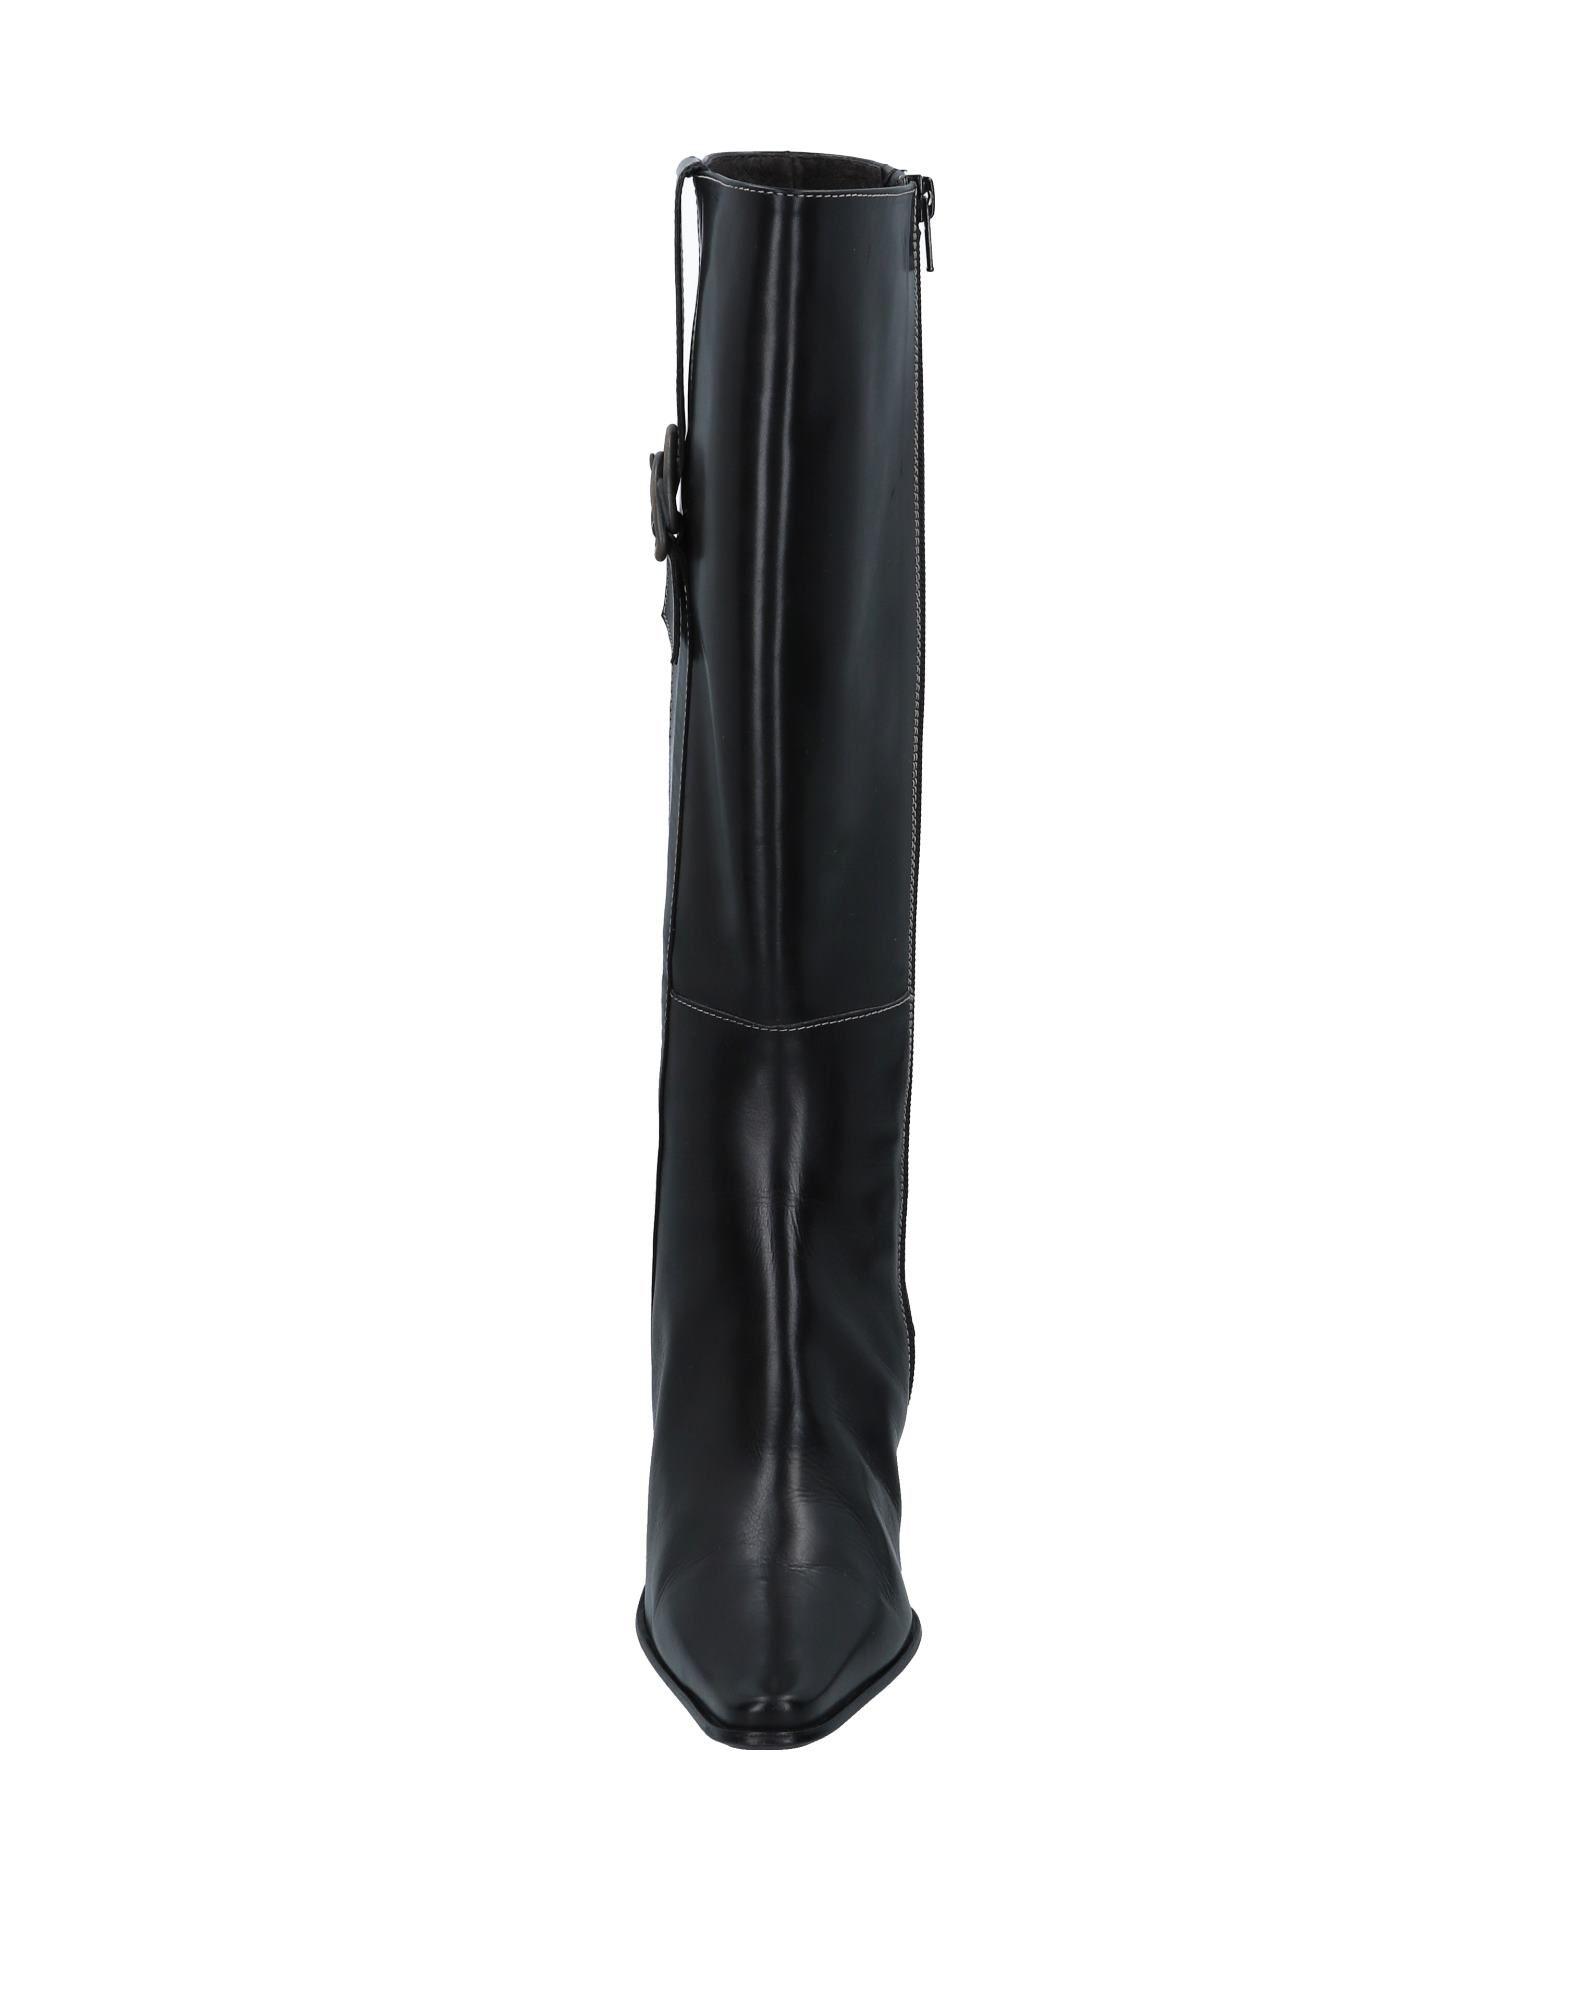 Le Gazzelle Stiefel Damen  11538008LJ Gute Qualität beliebte Schuhe